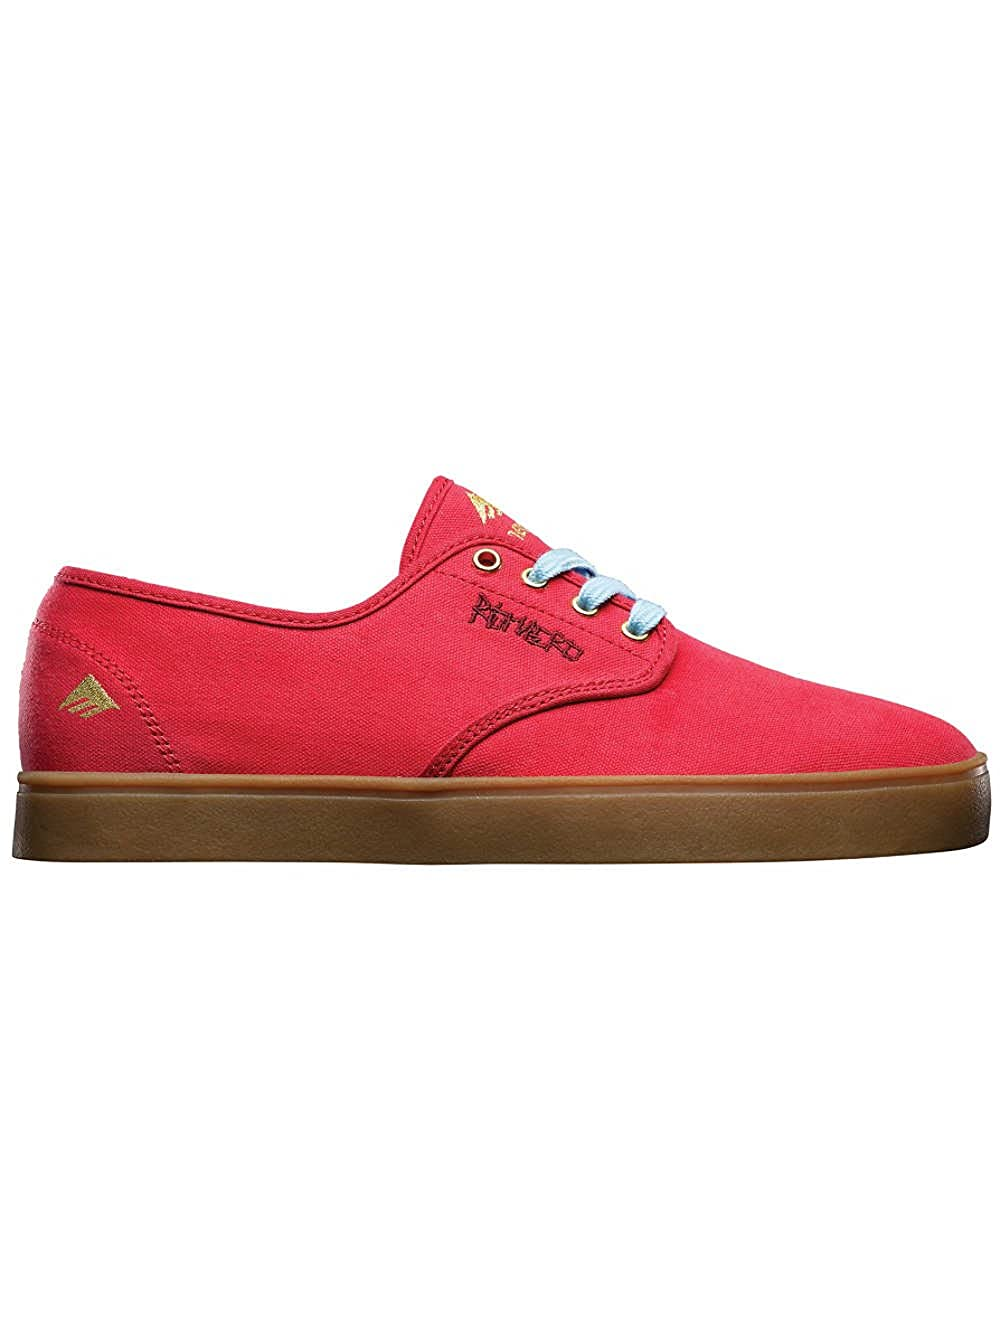 Emerica LACED Sneaker BY LEO ROMERO 6102000082 Herren Sneaker LACED ROT - ROT/Braun 3c8806